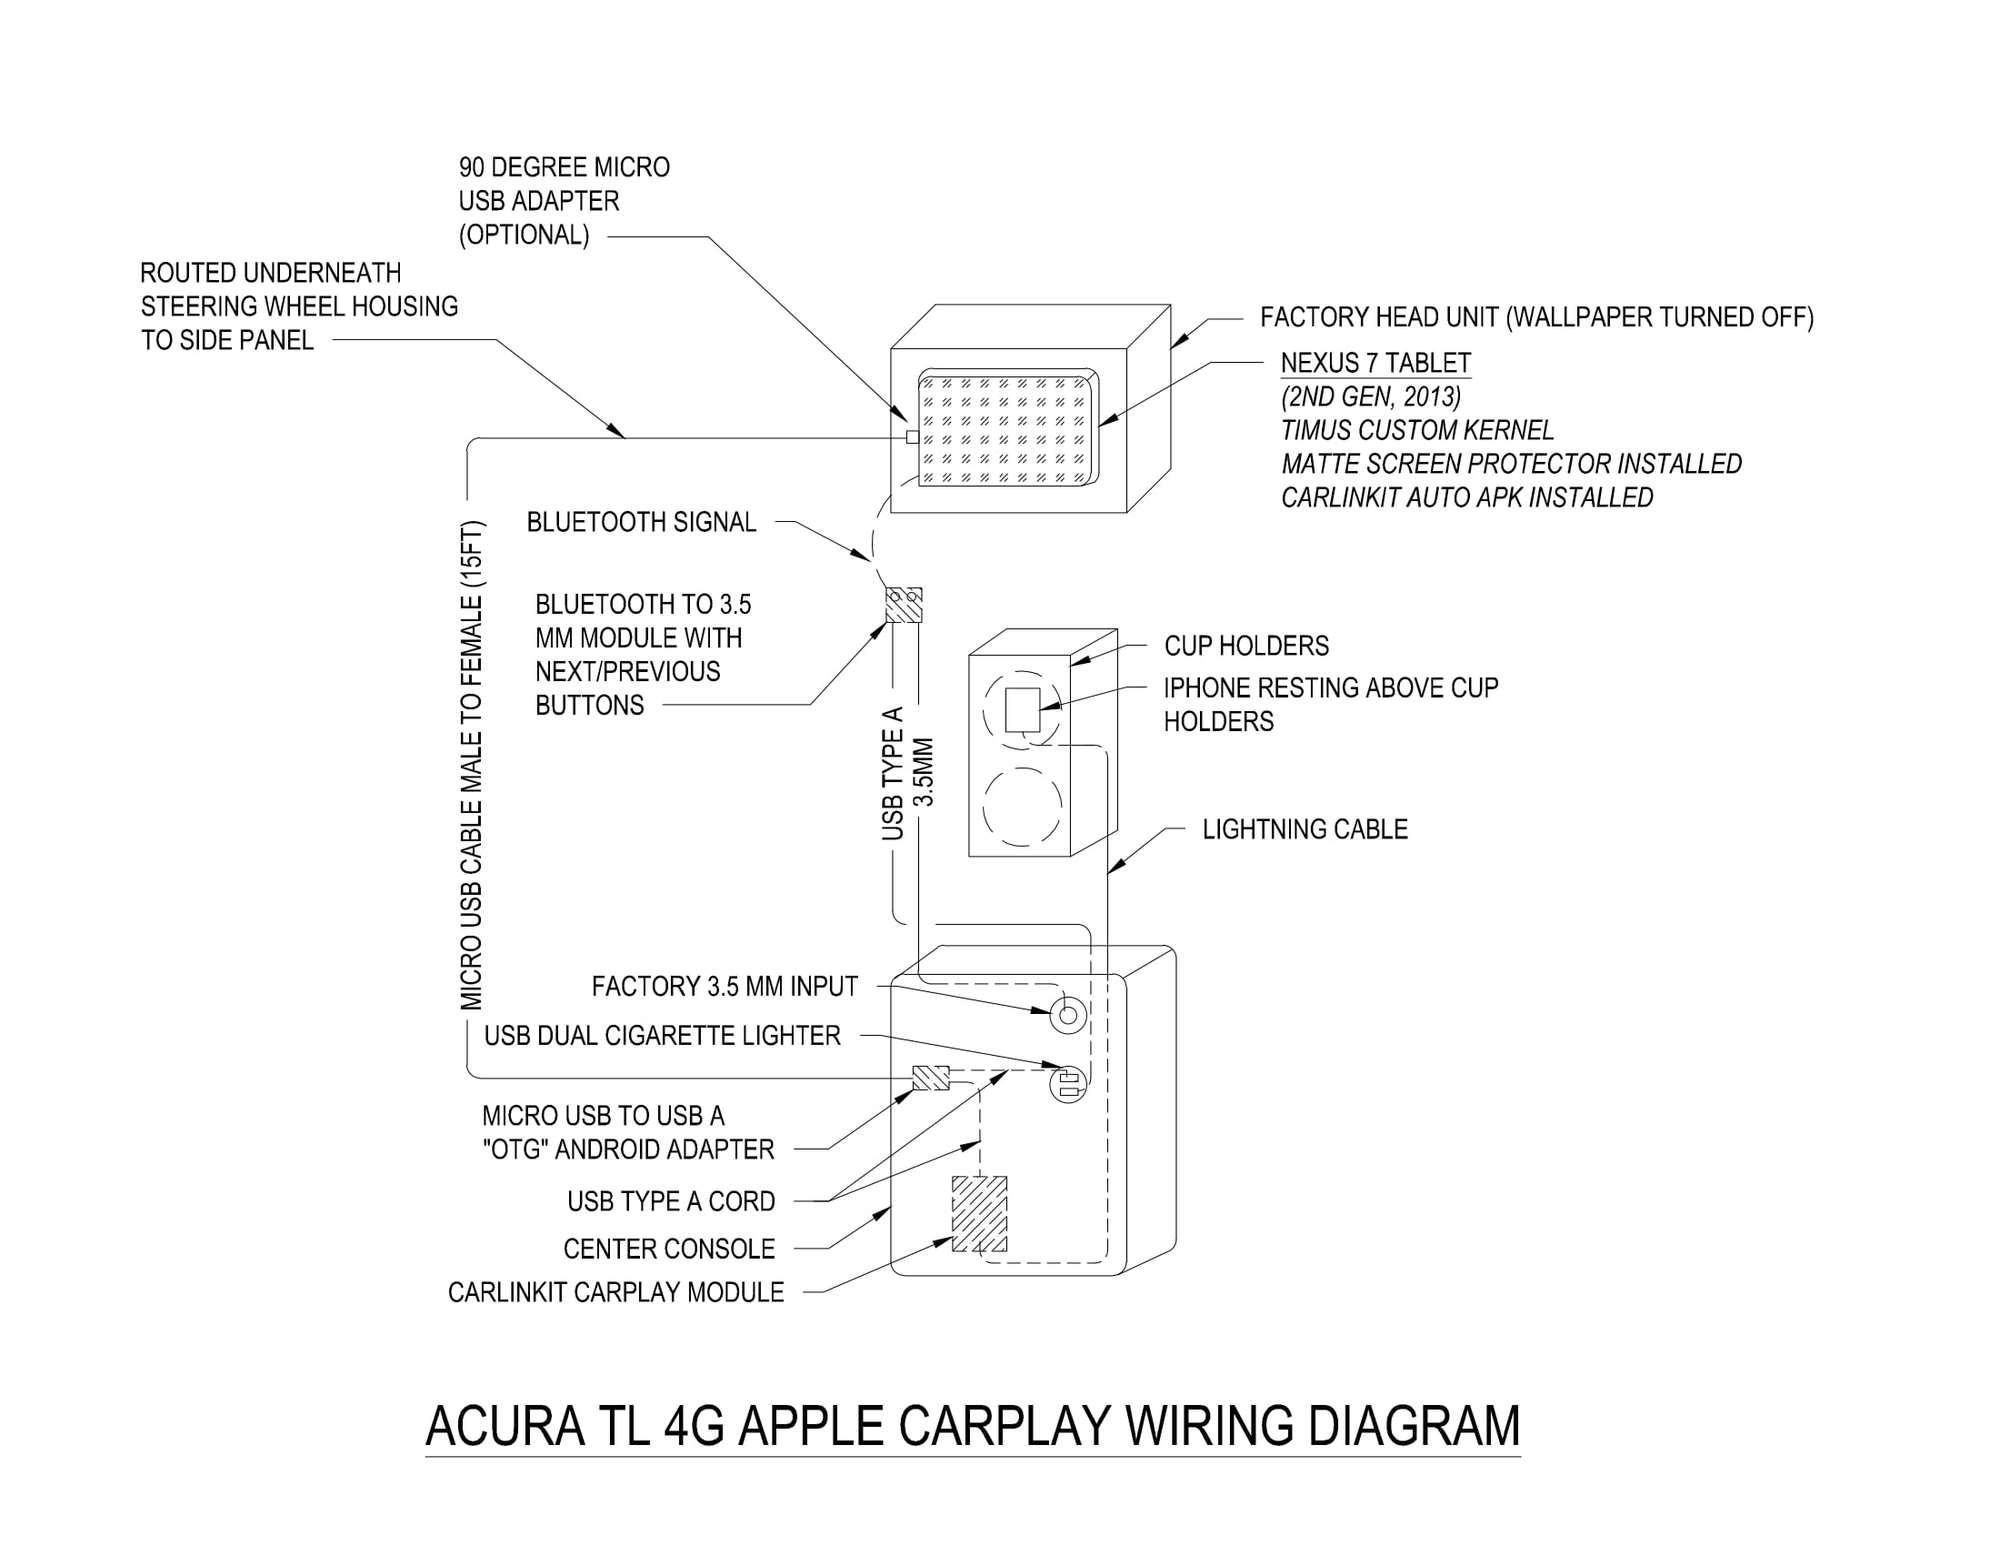 wiring diagram nexus solved acura 4g tech package carplay diy installation with  acura 4g tech package carplay diy